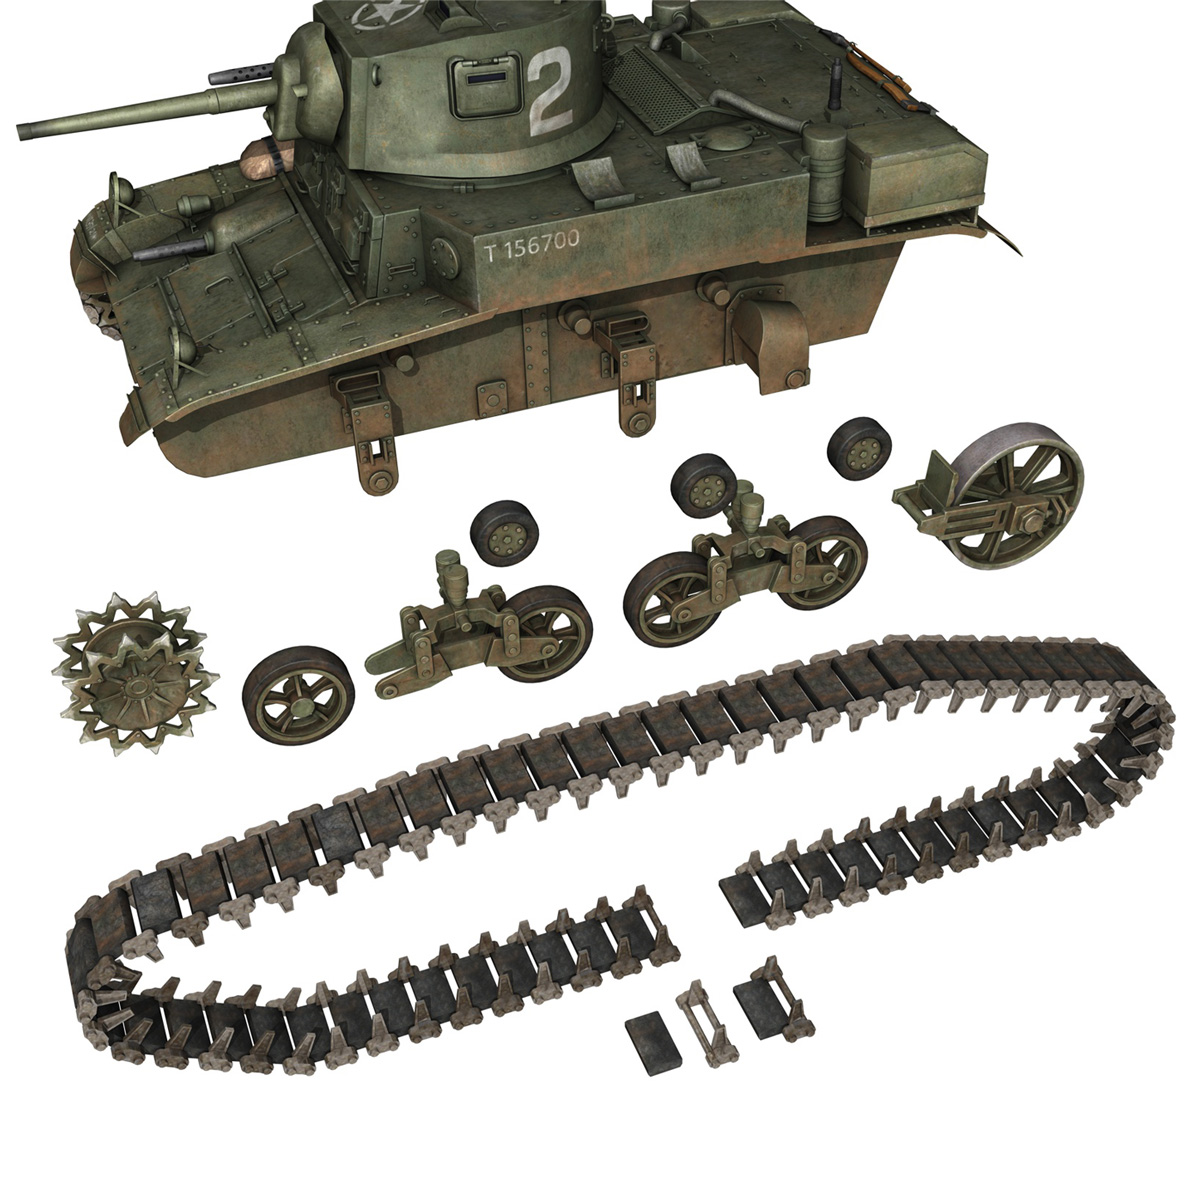 m3a1 light tank stuart – 156700 3d model c4d fbx lwo lw lws obj 3ds 265344